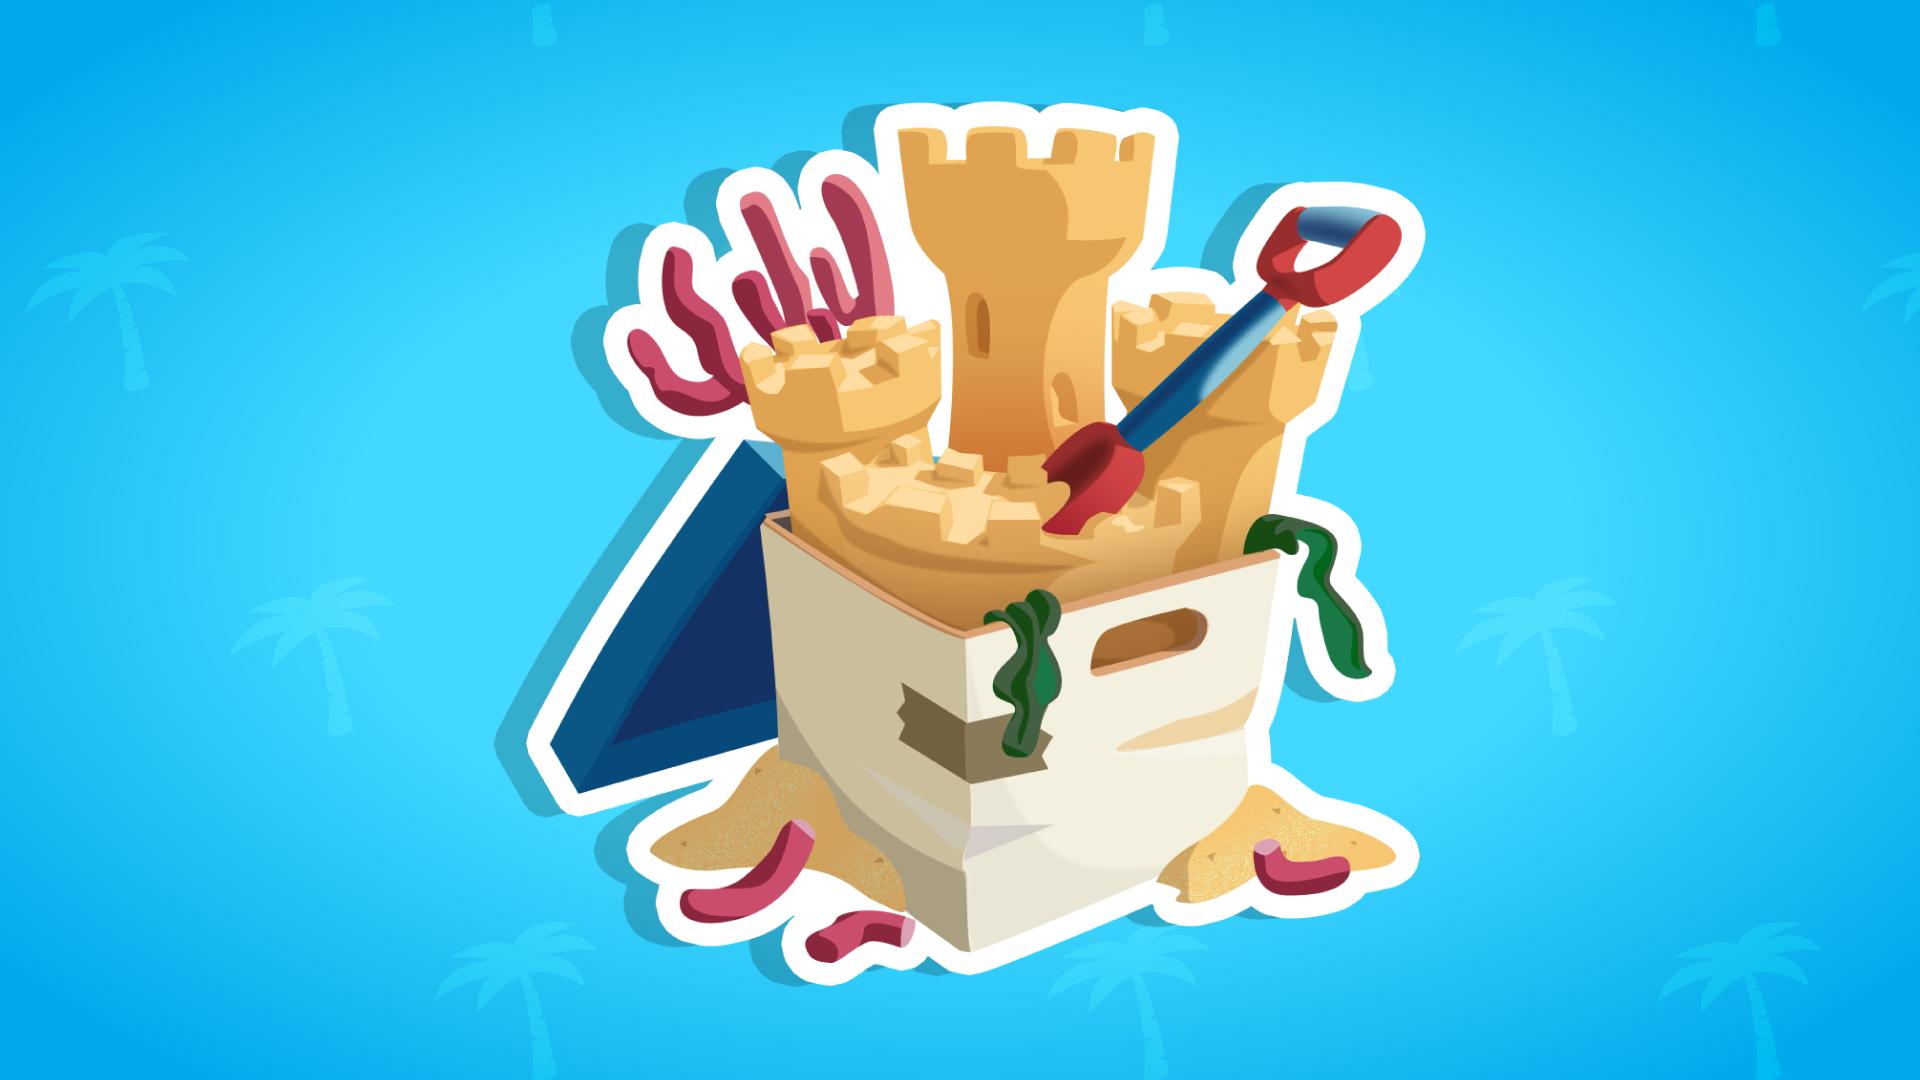 Icon for SMASH!